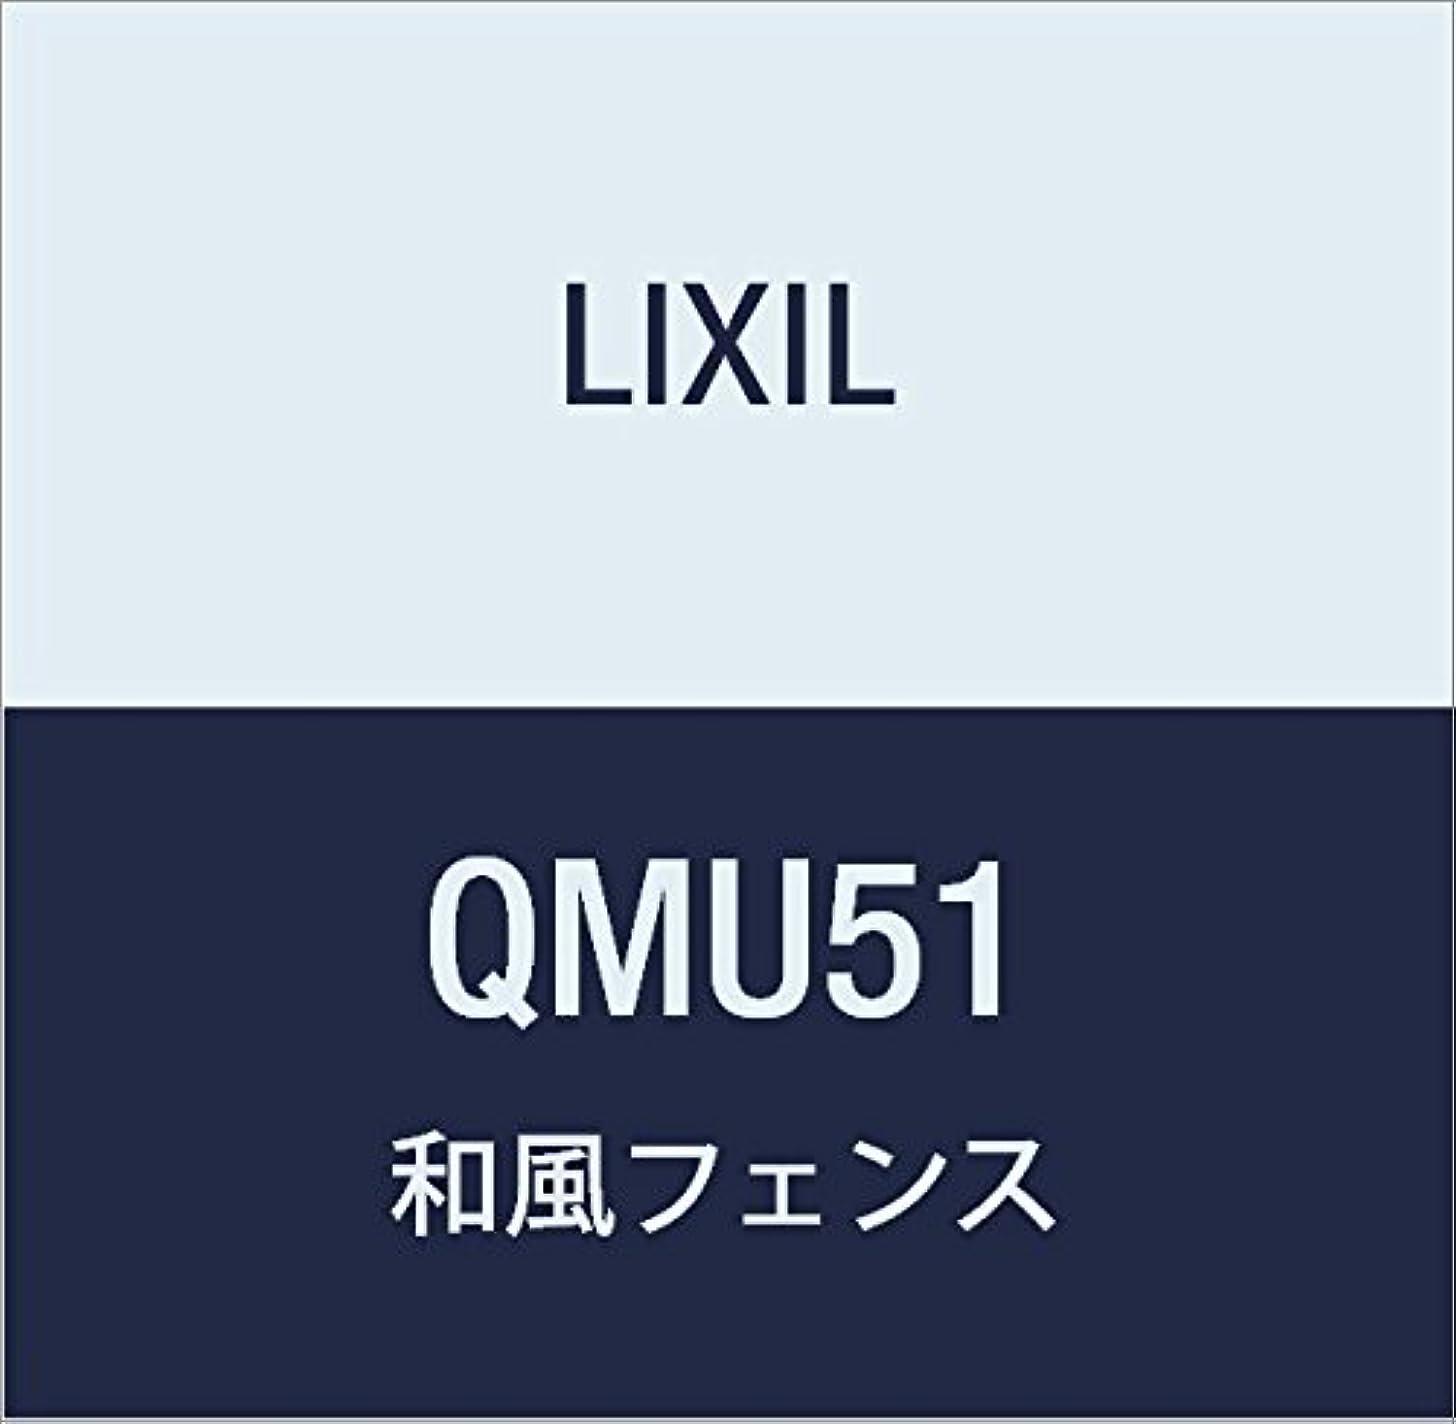 LIXIL(リクシル) TOEX 京香建仁寺垣 ユニット型間仕切本体 片面T10W10 枯竹 QMU51